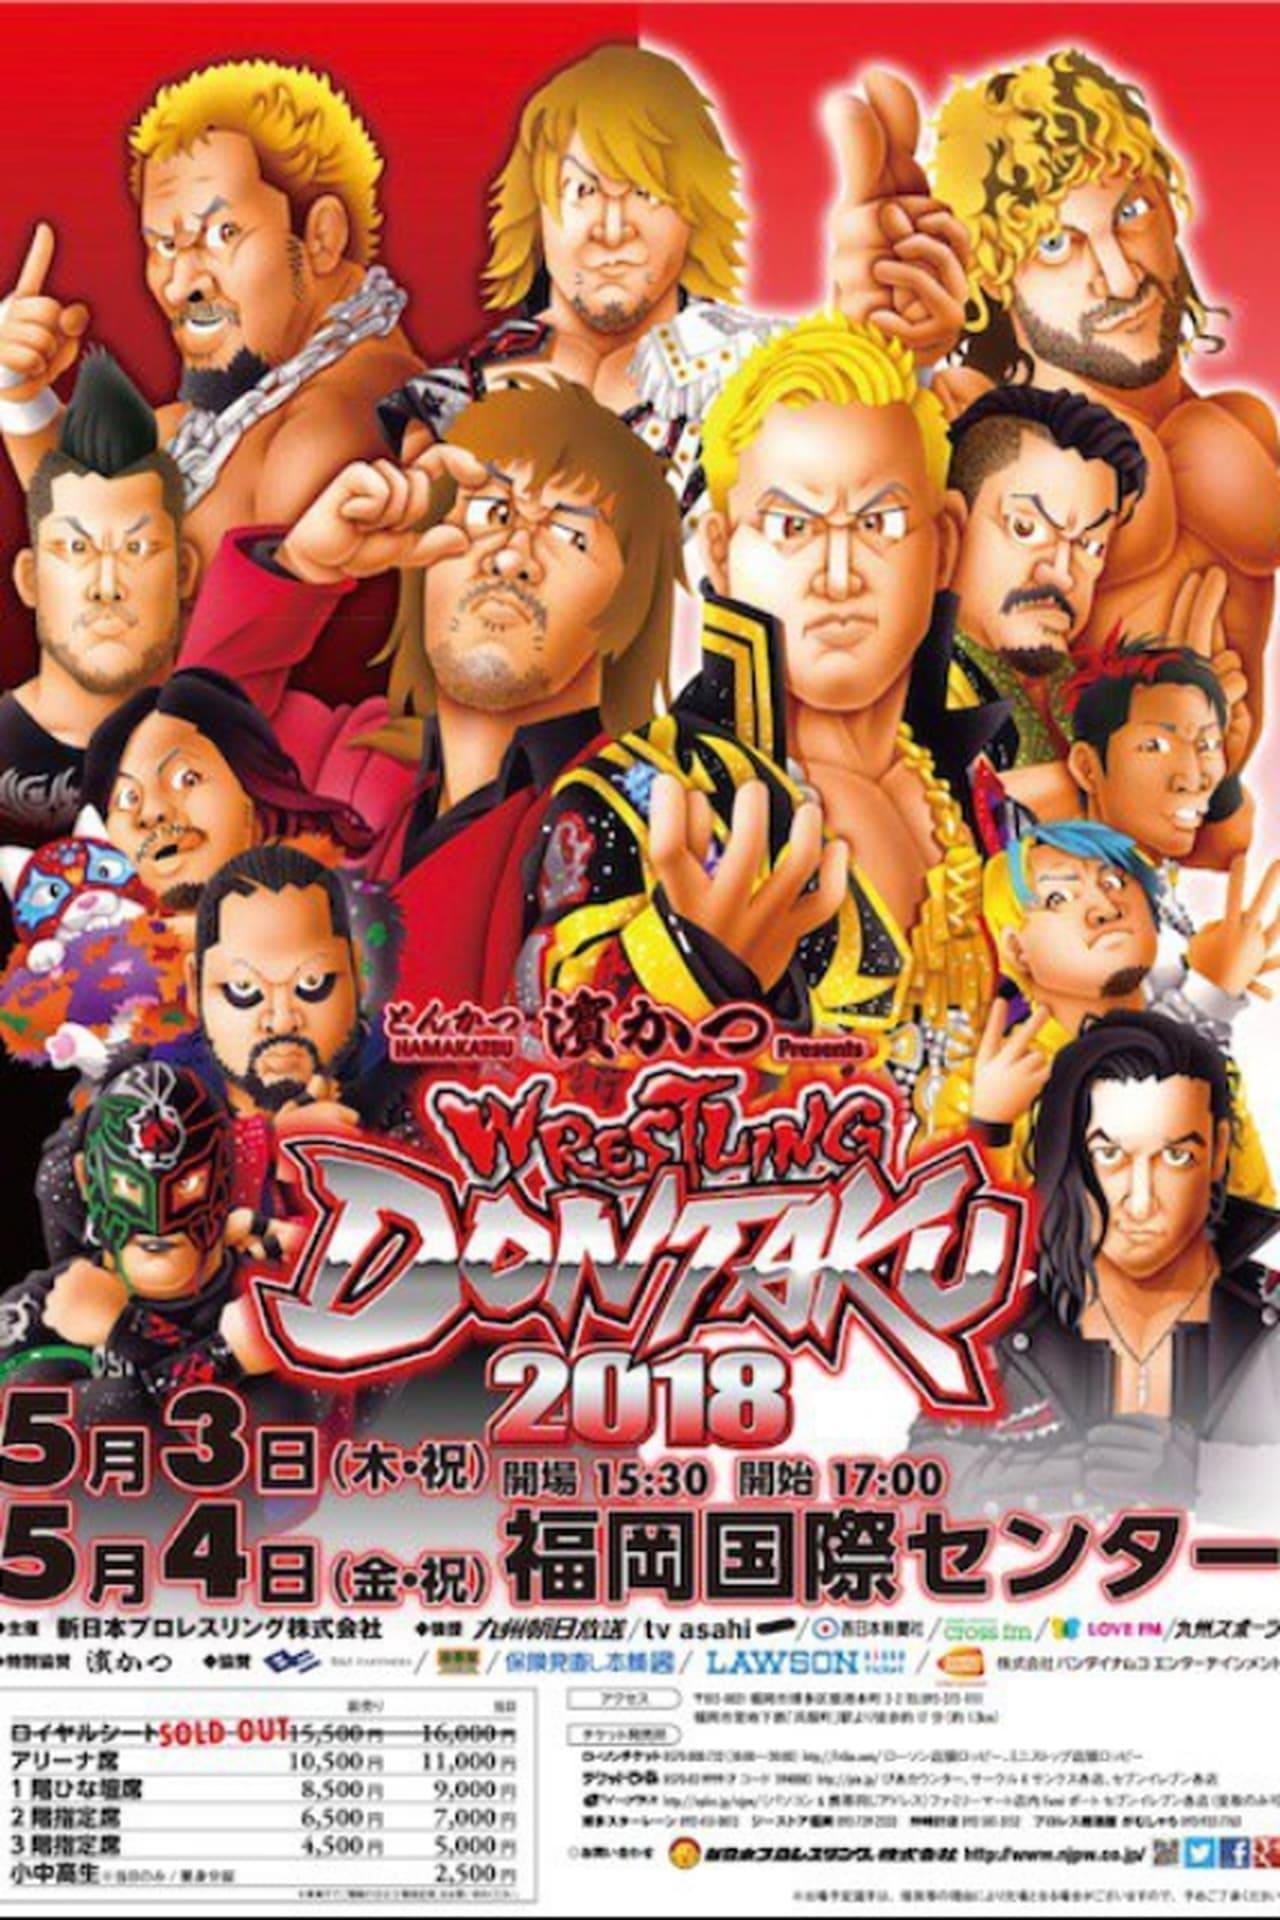 NJPW Wrestling Dontaku 2018 - Night 2 (2018)